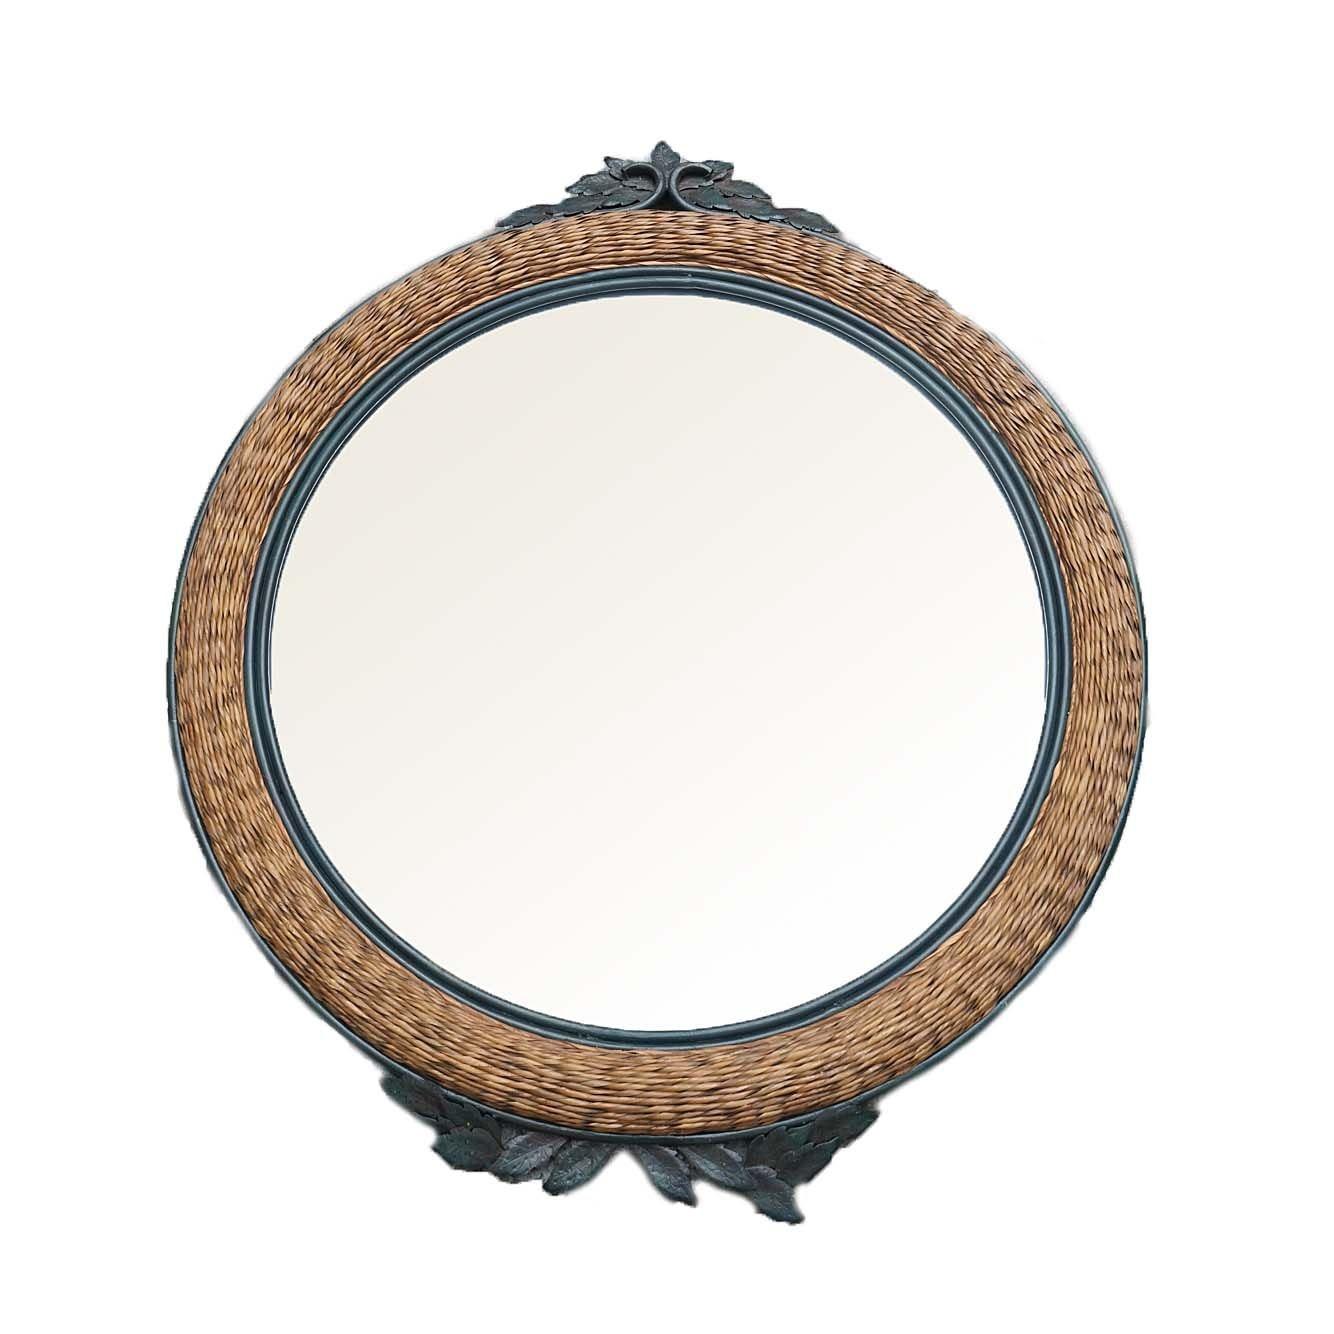 Round Metal Framed Twisted Rattan Wall Mirror with Foliate Motifs